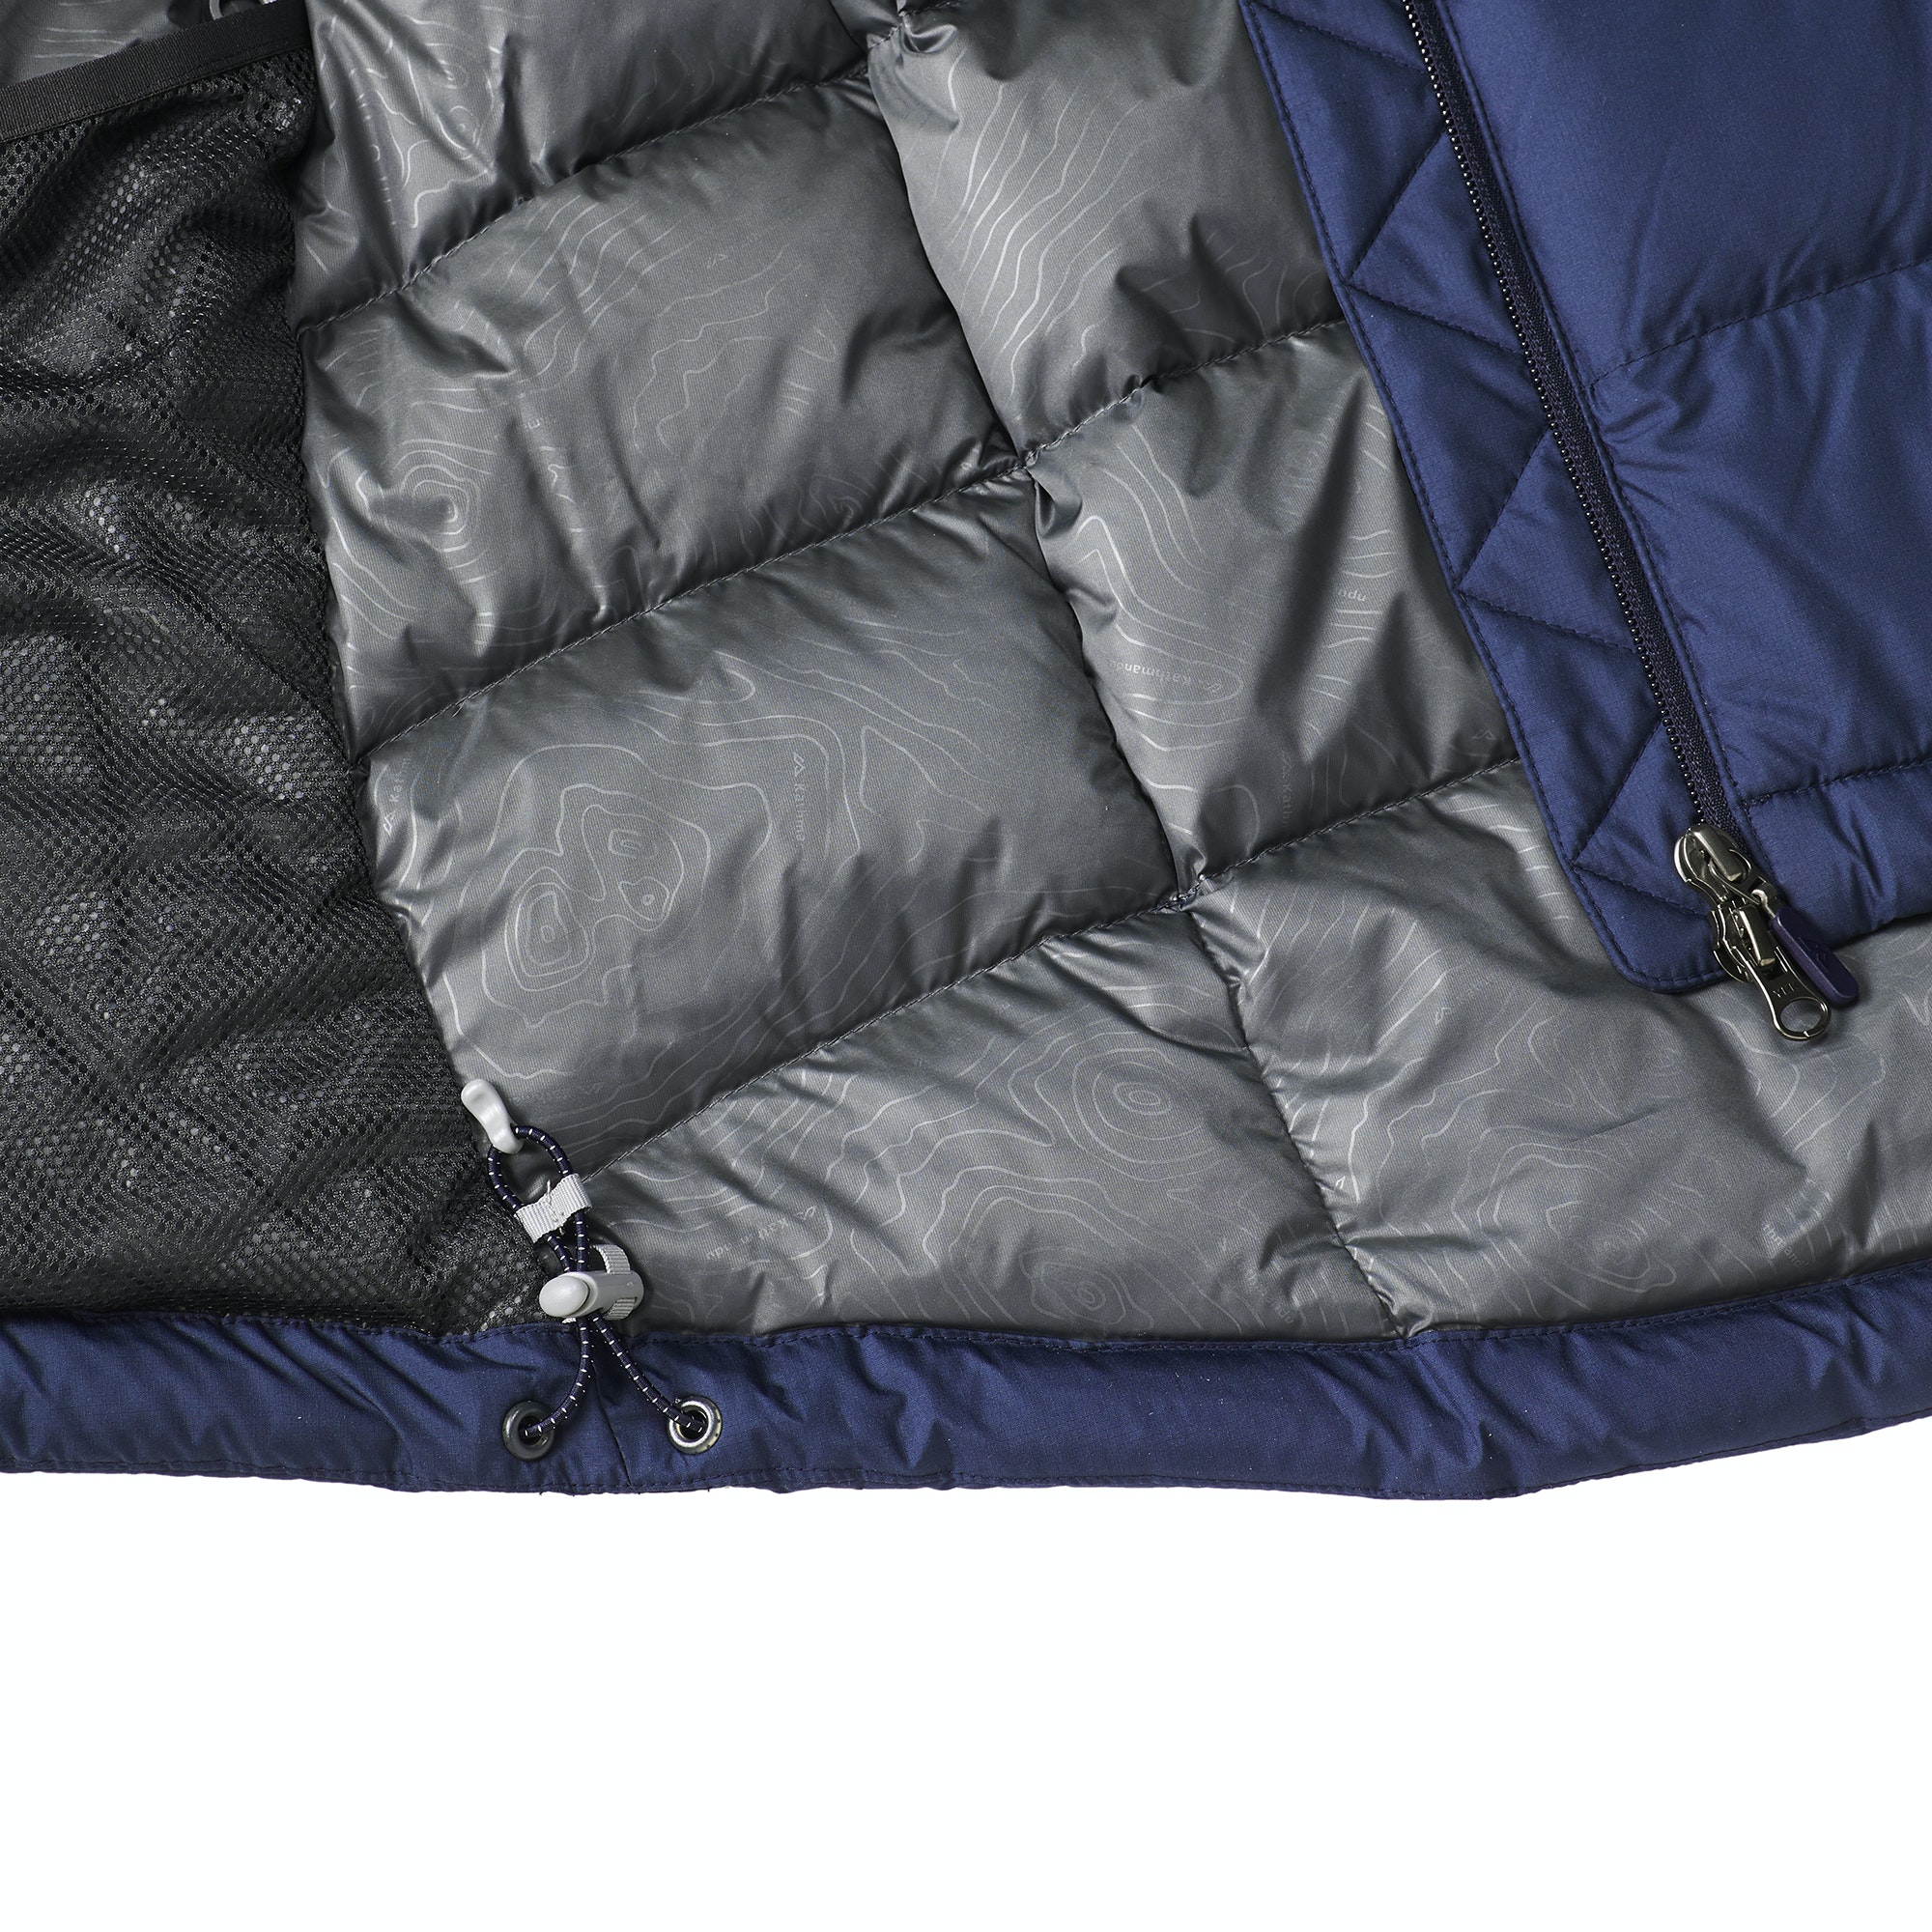 NEW-Kathmandu-Epiq-Men-039-s-Warm-Winter-Duck-Down-Puffer-Jacket-v2 thumbnail 24